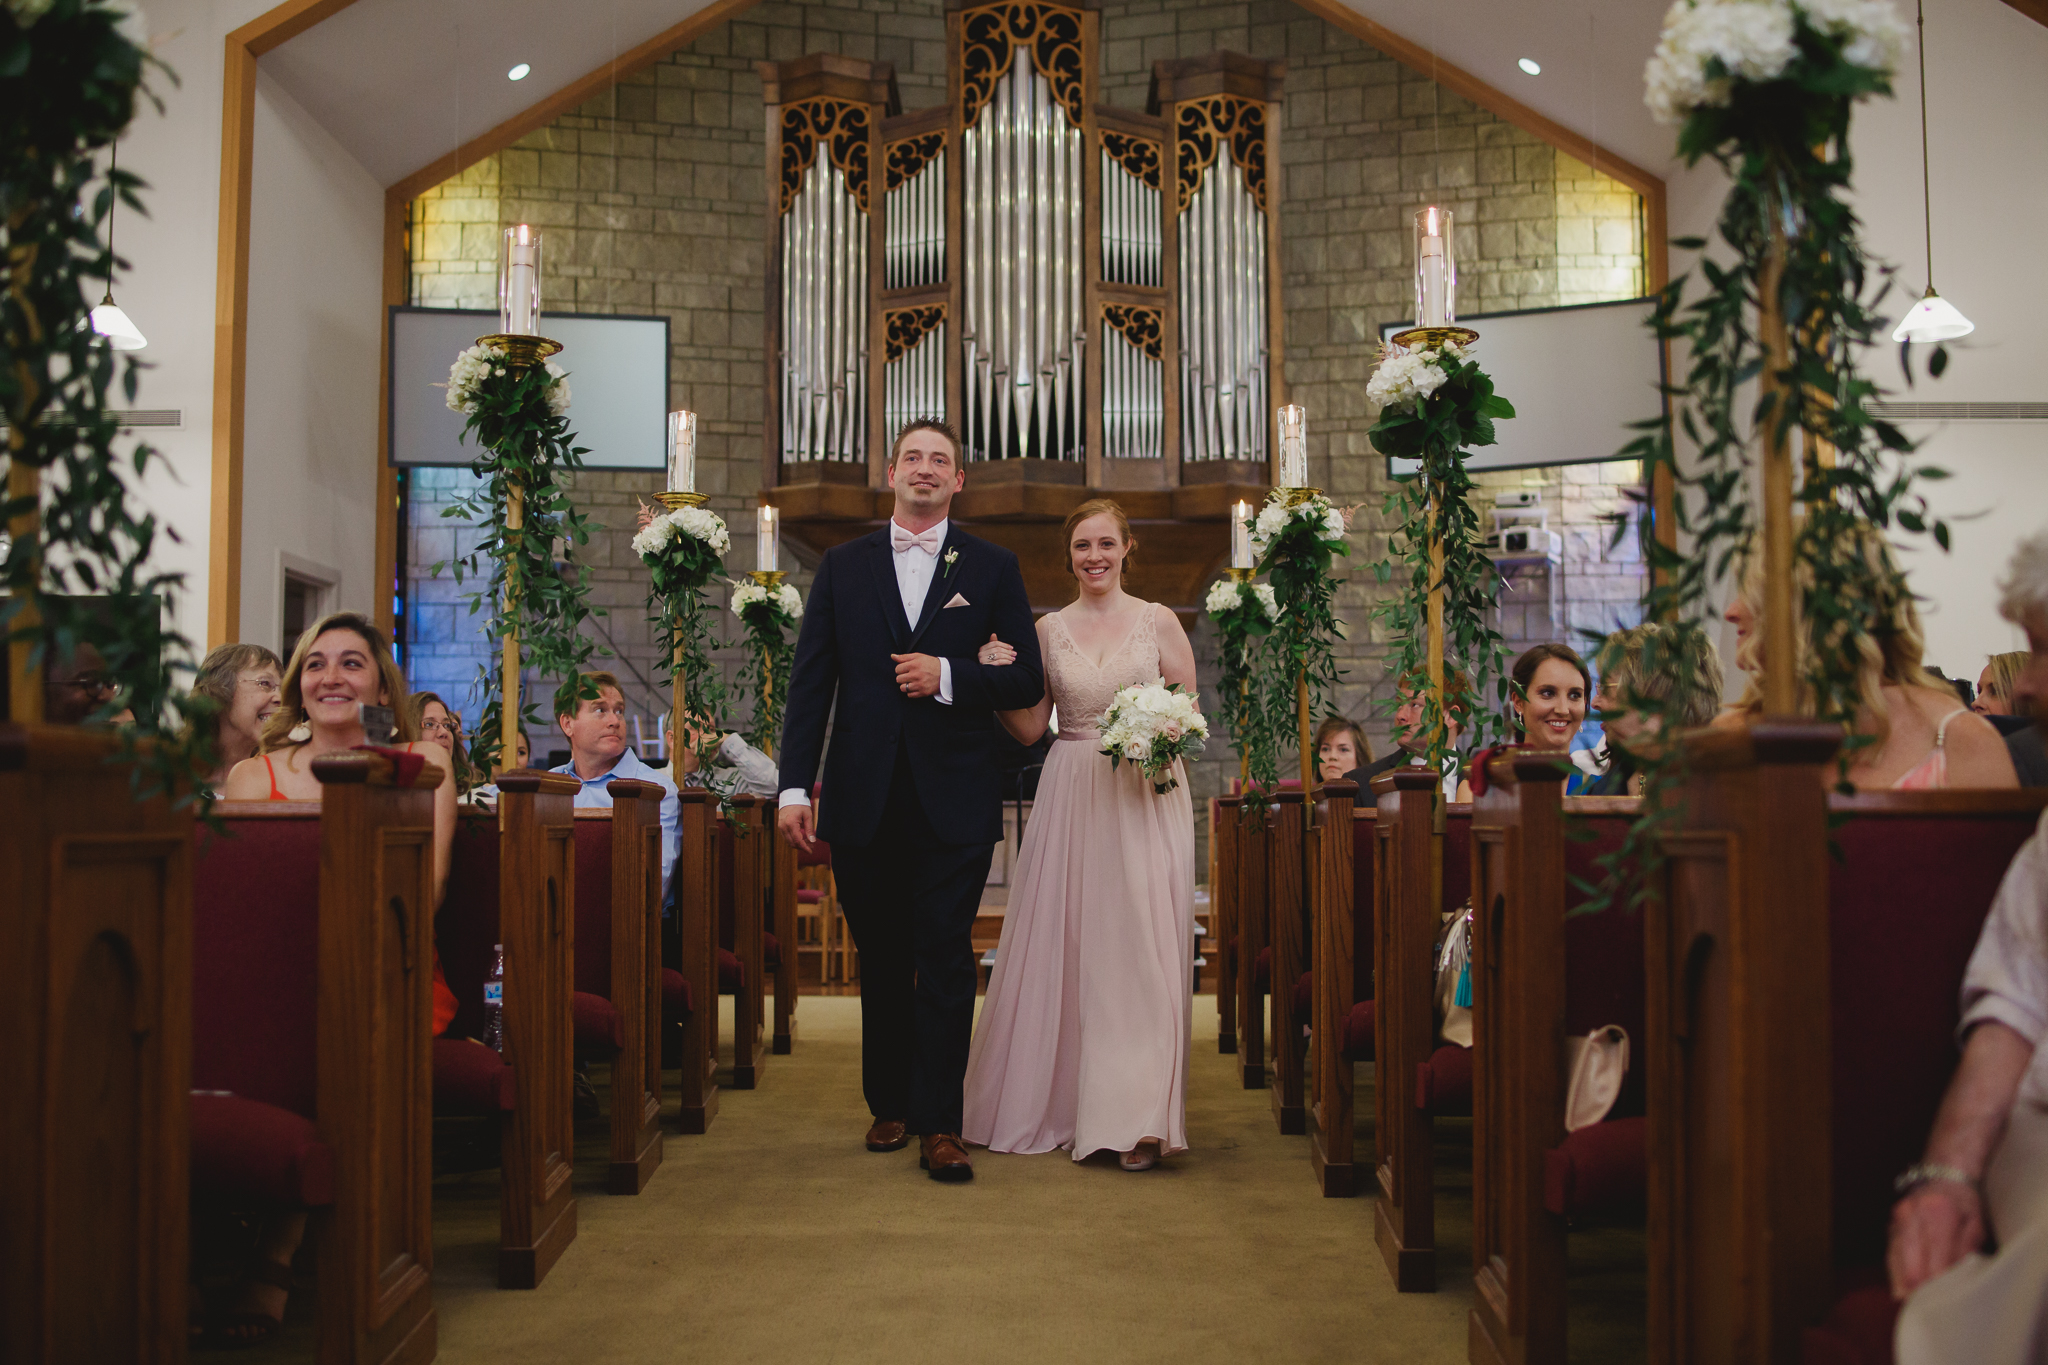 Michael and Kelly - the ashton depot - wedding DFW - wedding photographer- elizalde photography (22 of 150).jpg